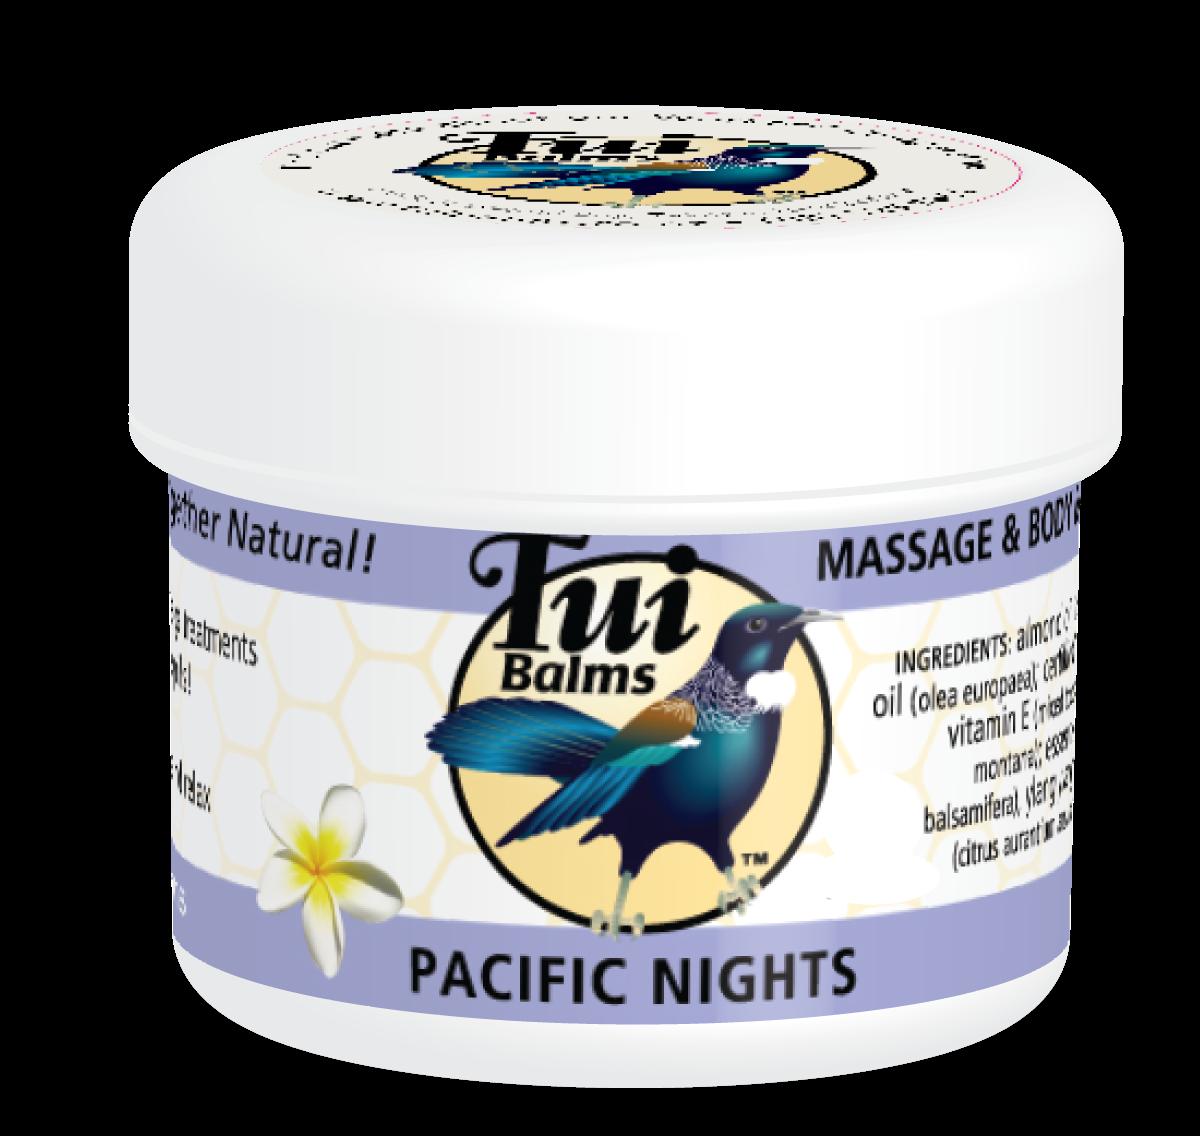 Massage & Body Balm PACIFIC NIGHTS